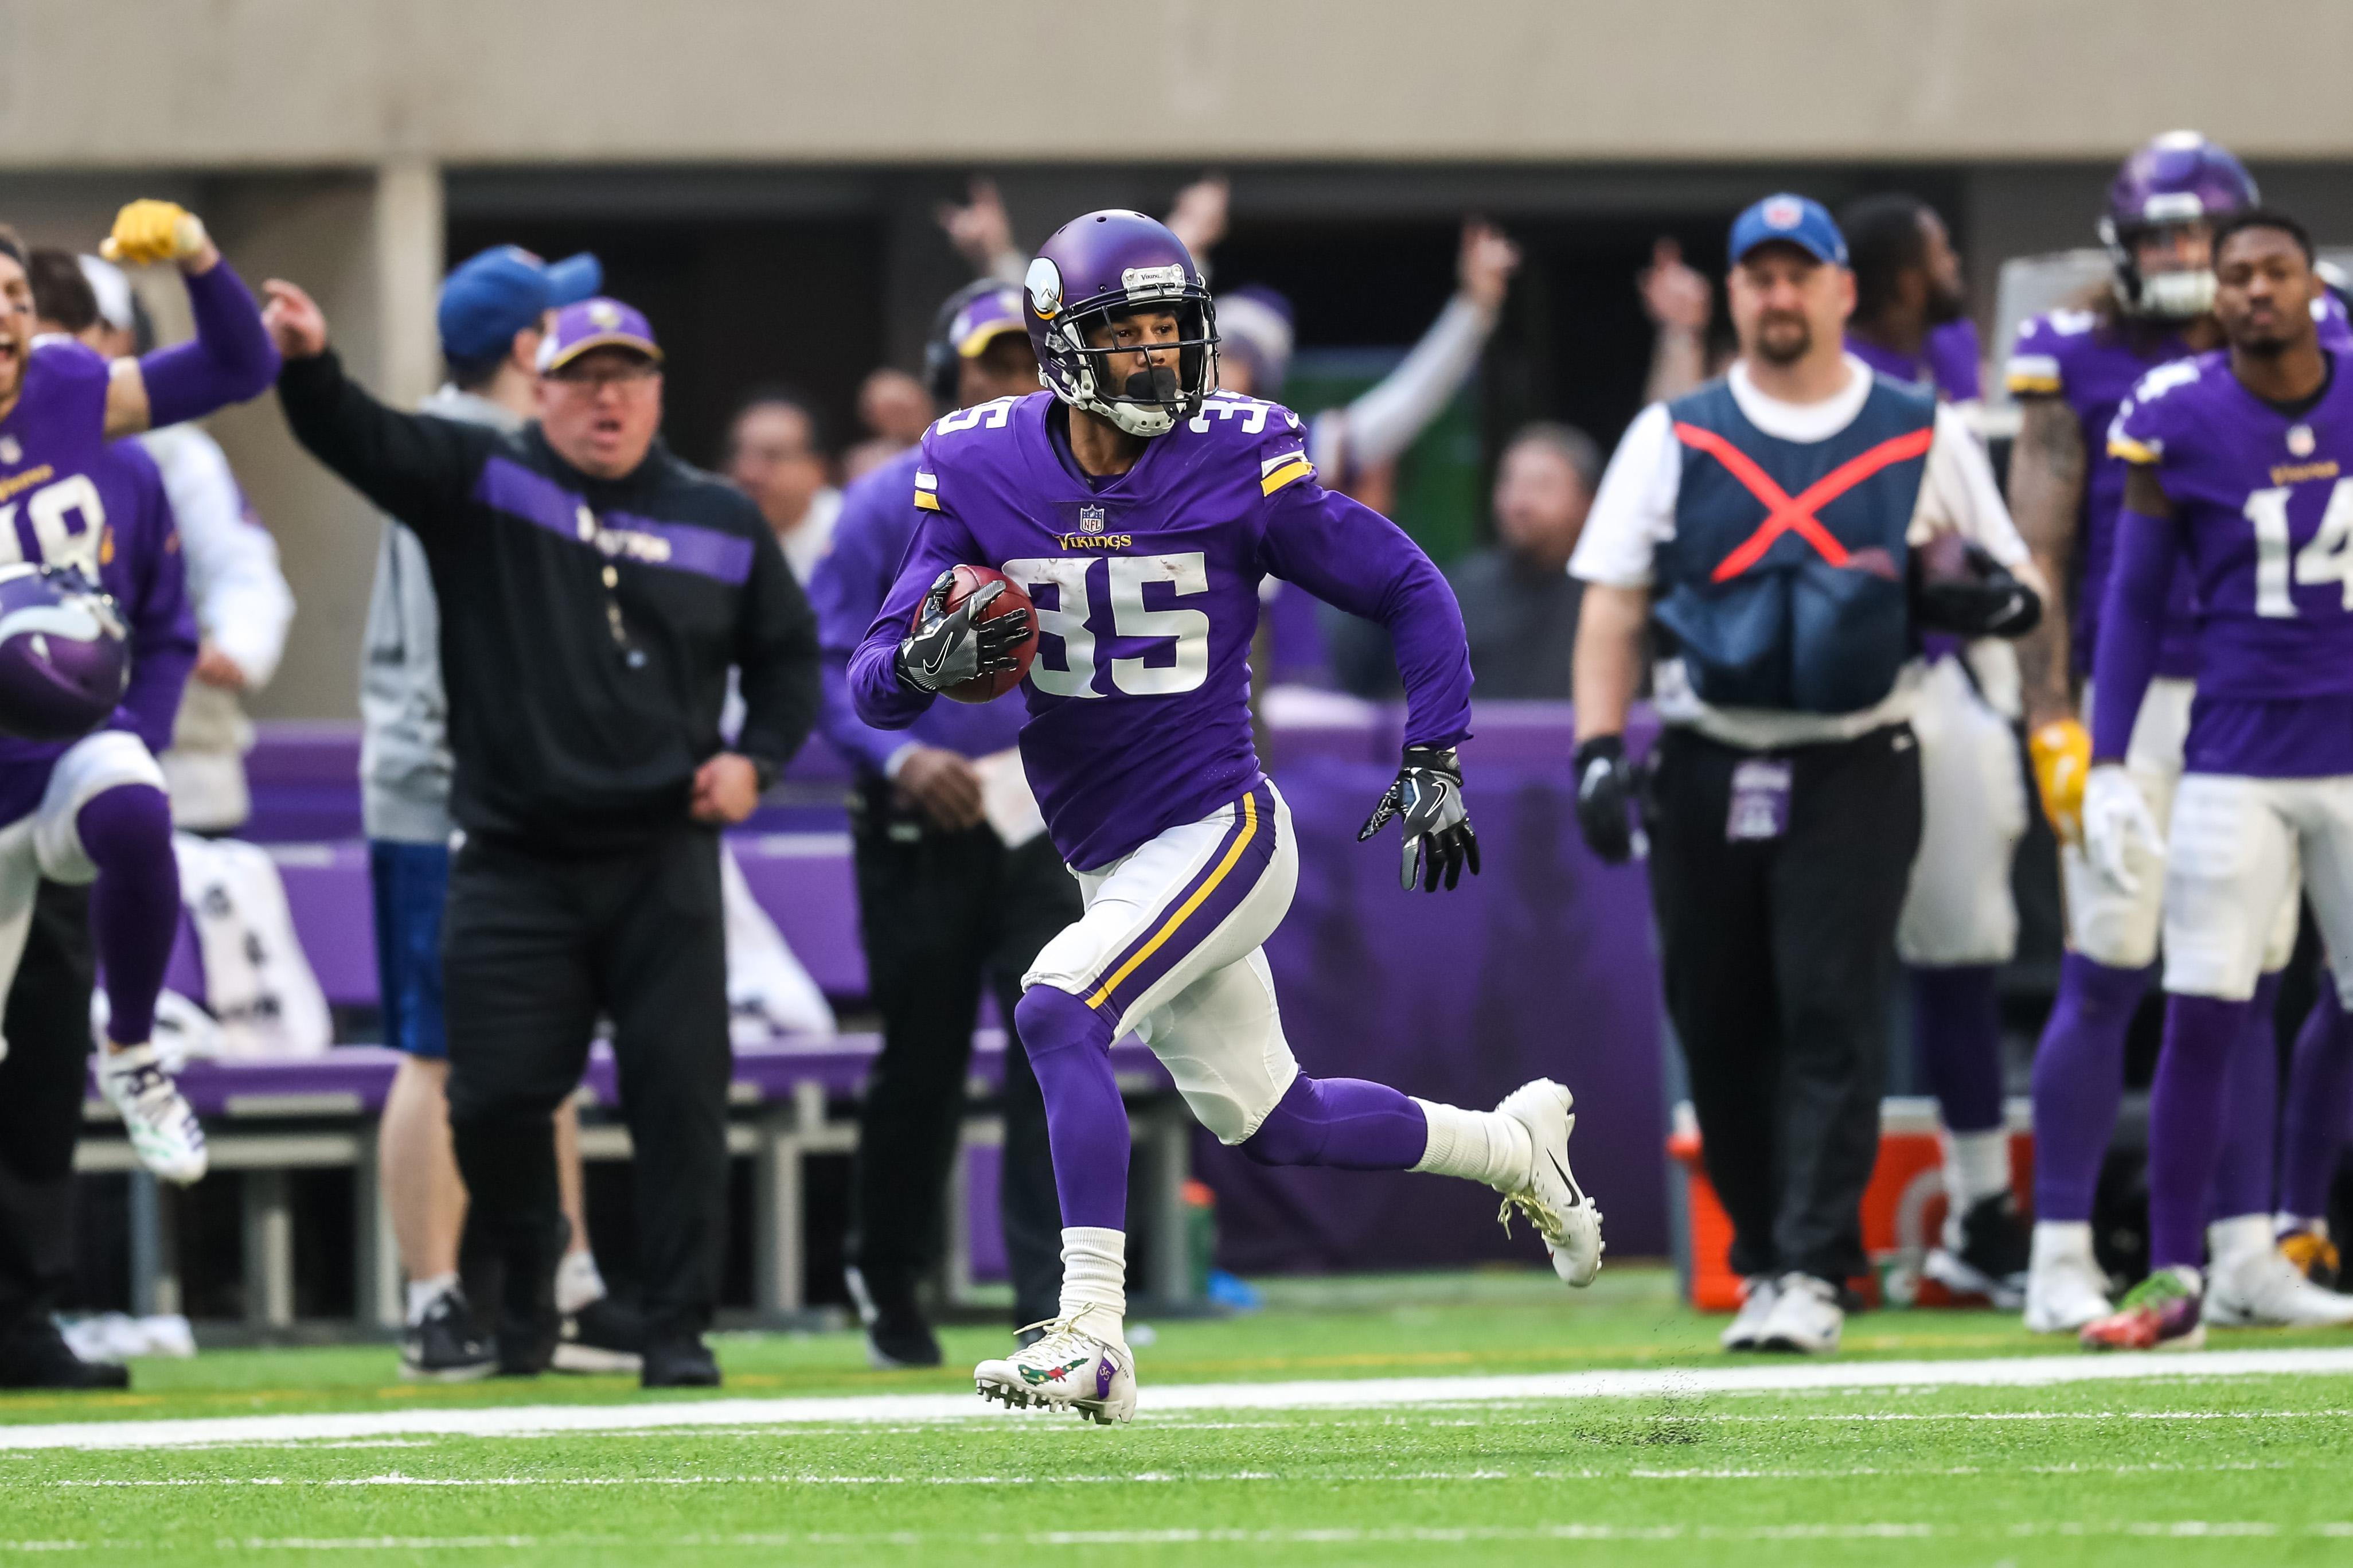 NFL: Miami Dolphins at Minnesota Vikings